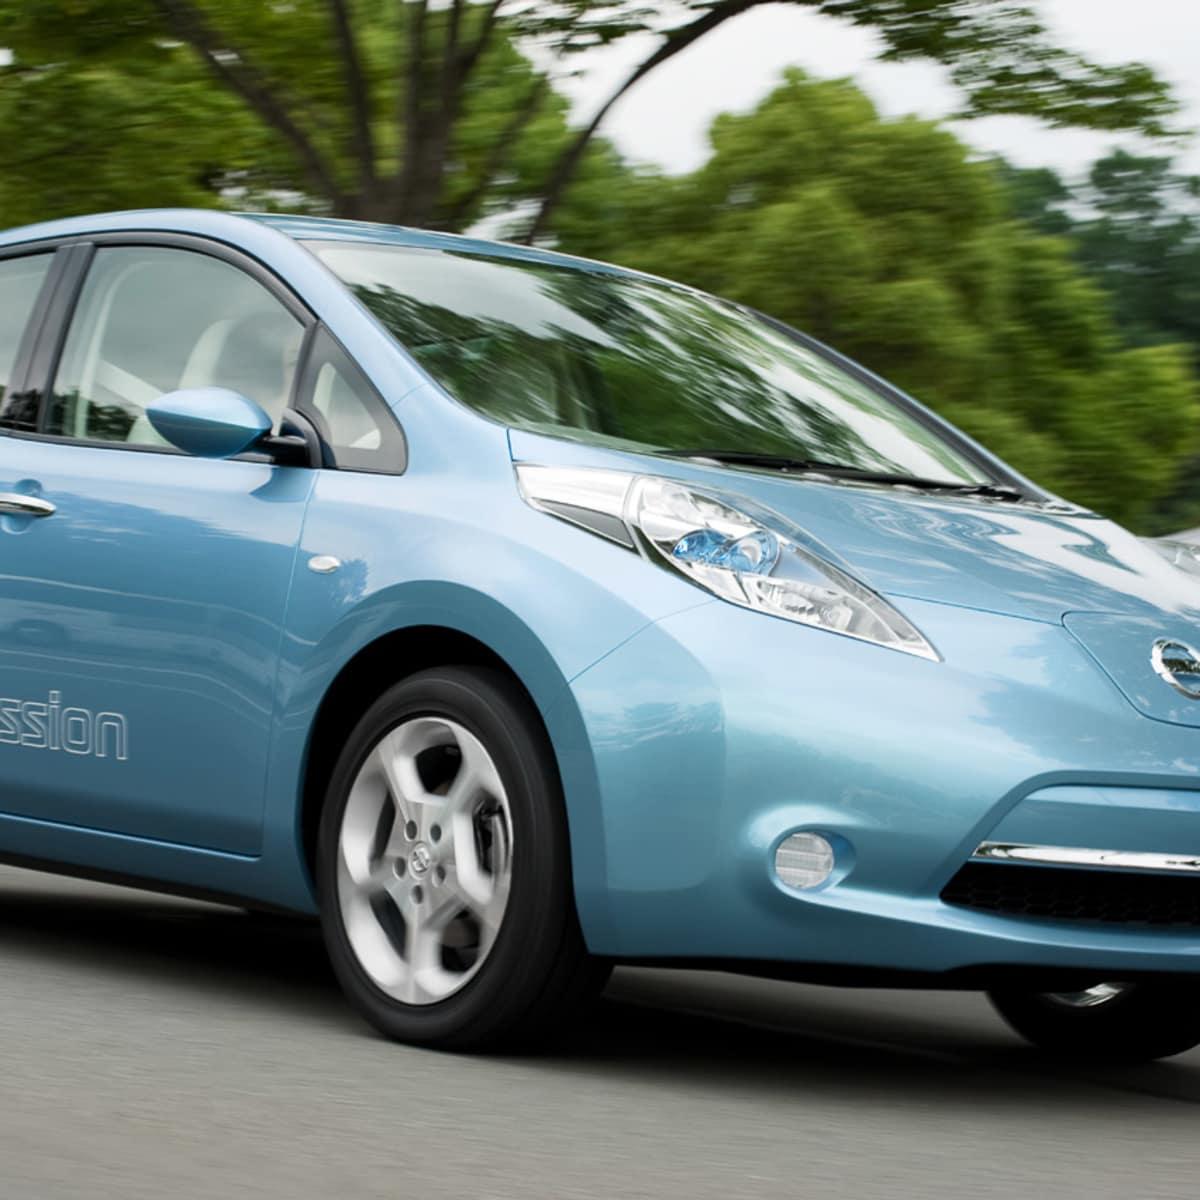 Ways to make Houston greener: Bury power lines, charge a car, turn ...